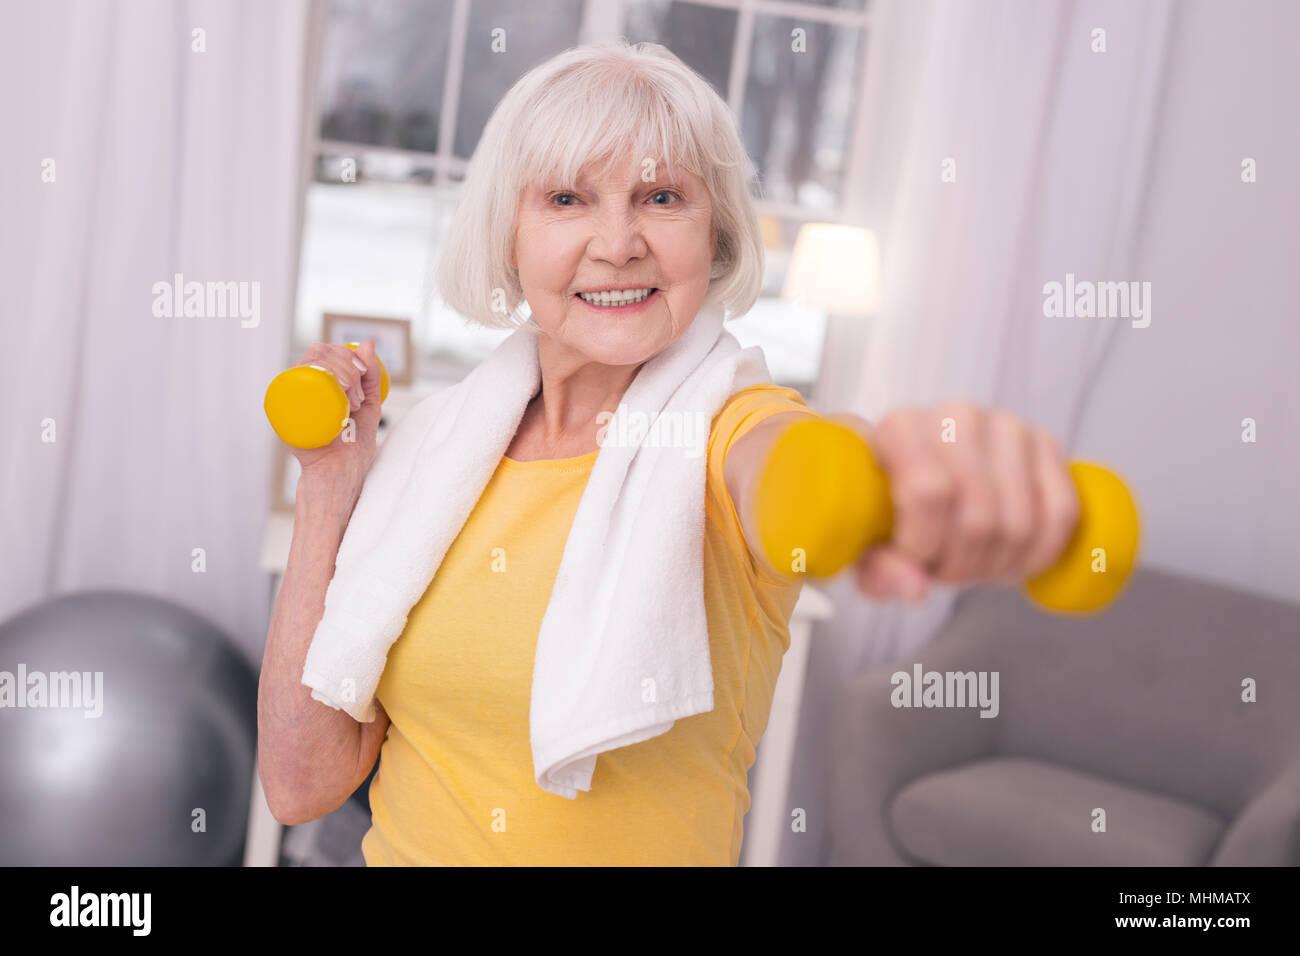 Joyful elderly woman exercising with dumbbells - Stock Image